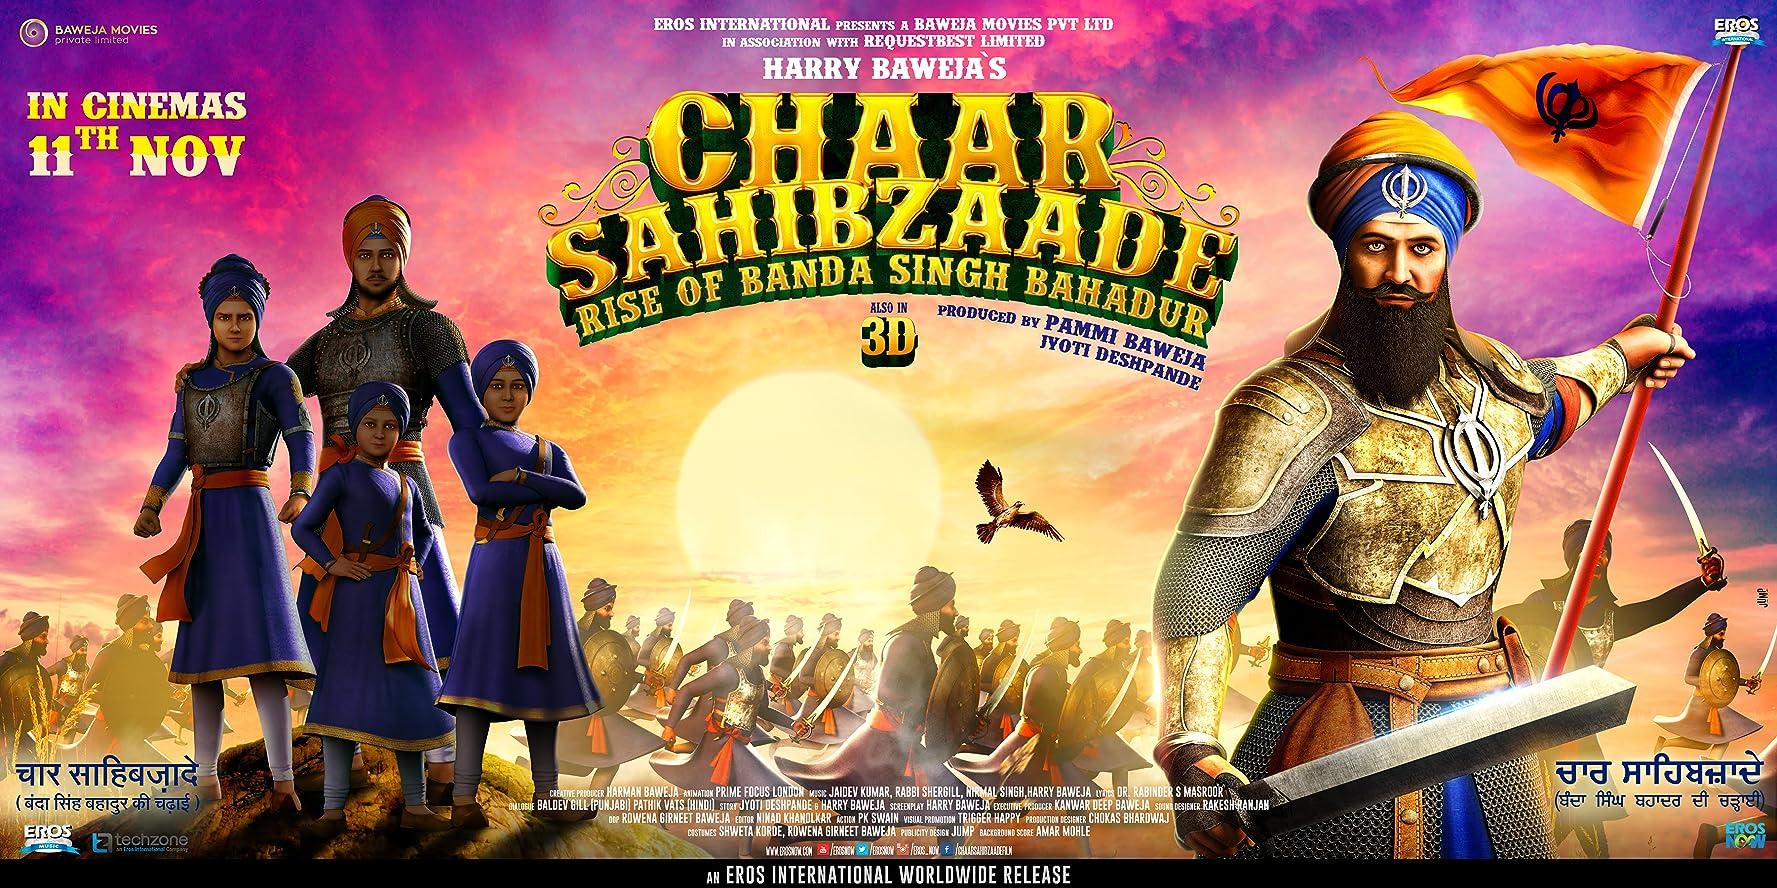 Chaar Sahibzaade 2 Rise Of Banda Singh Bahadur 2016